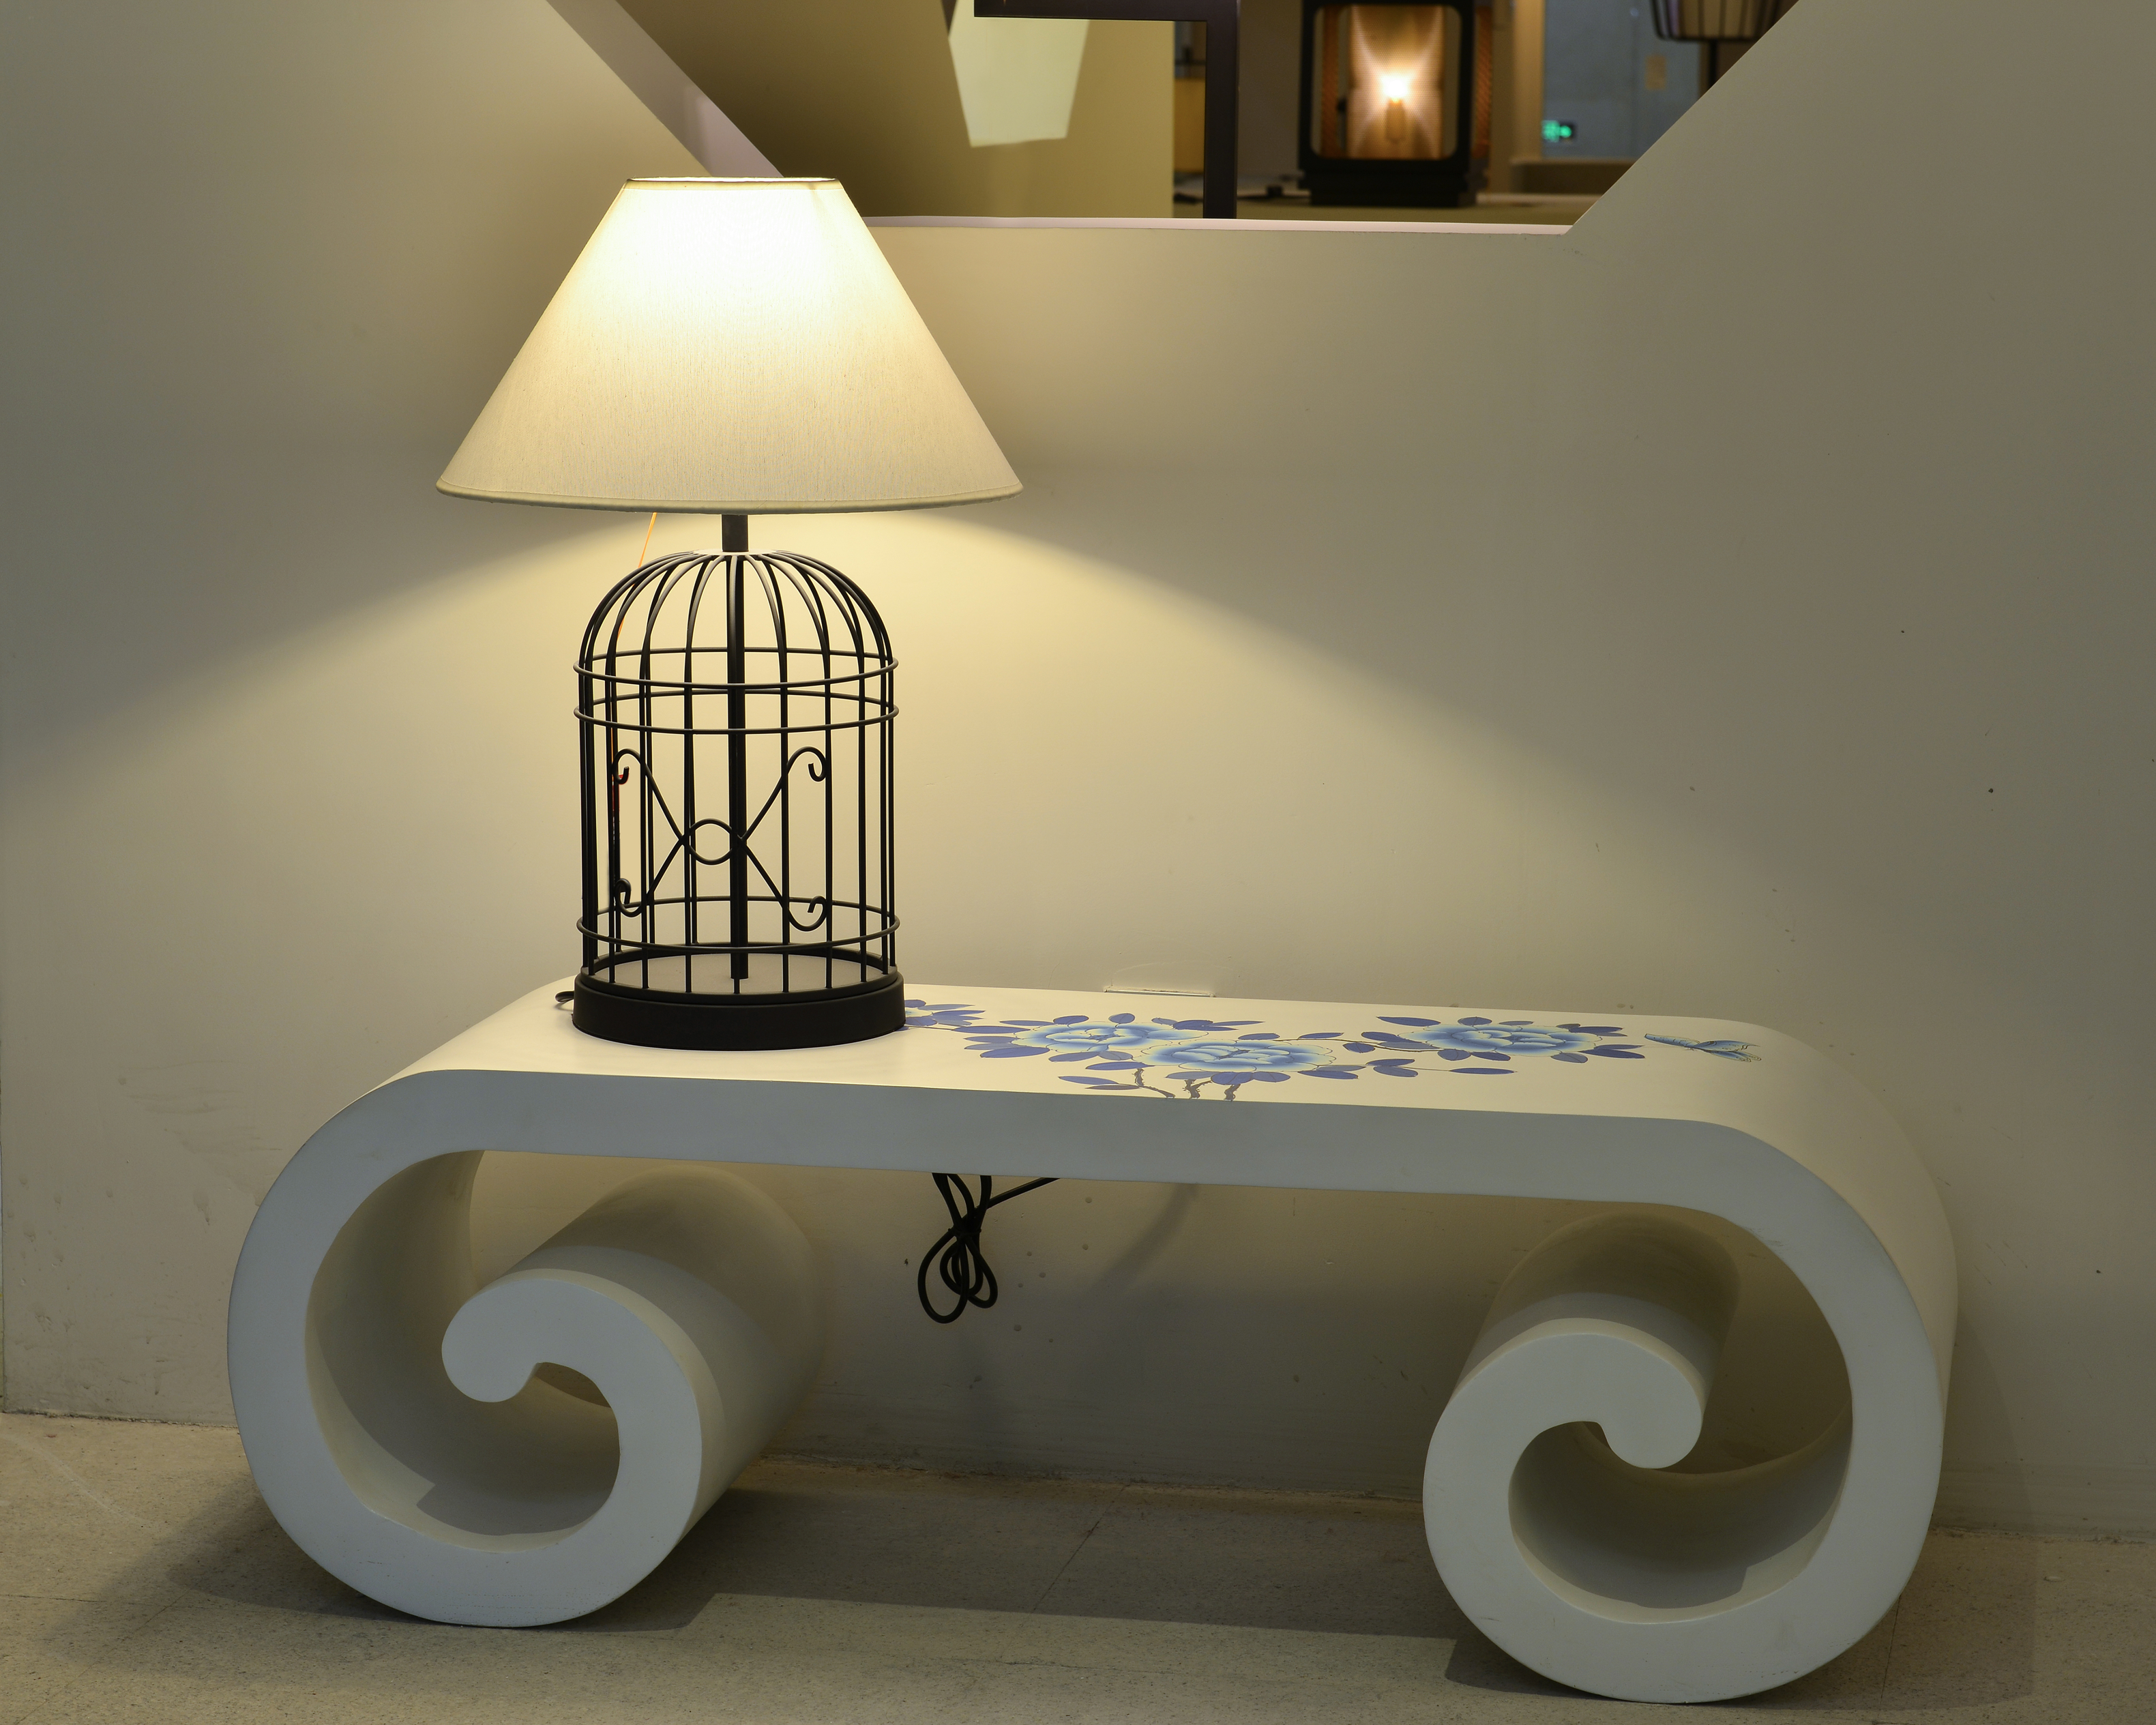 Diy Bird Cage Chandelier Diy Birdcage Stylish Affordable